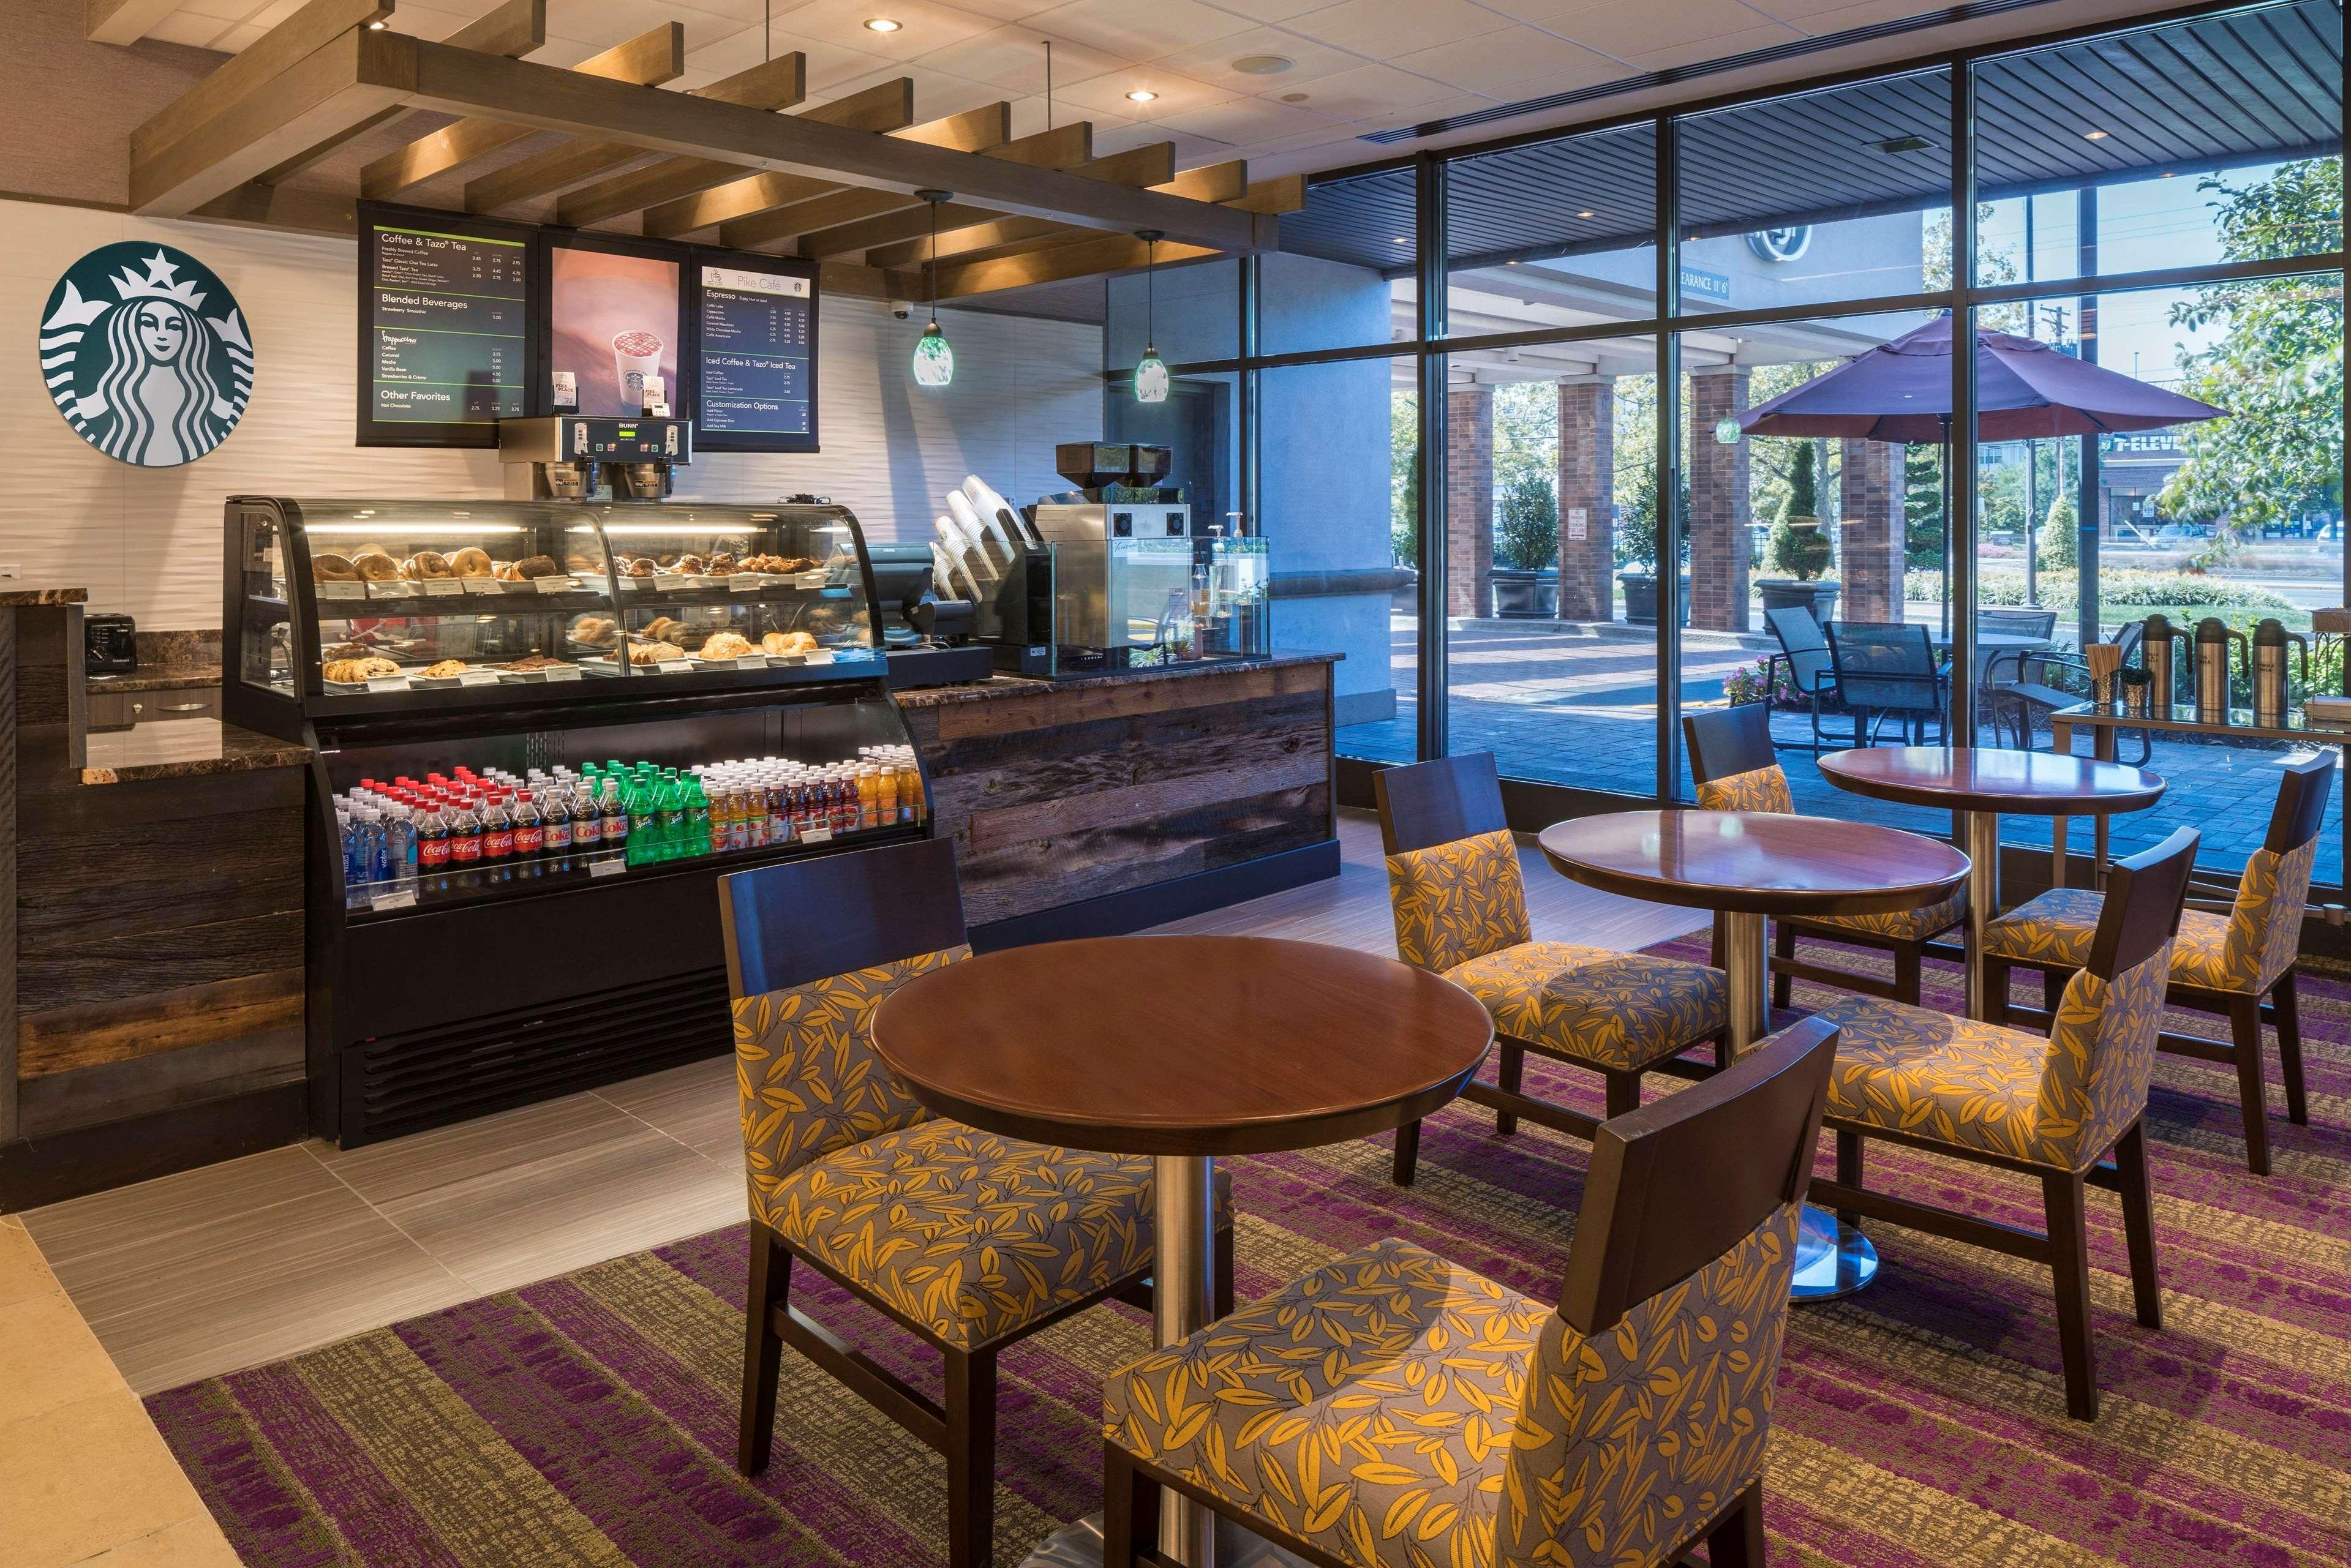 hilton washington dc rockville hotel executive meeting. Black Bedroom Furniture Sets. Home Design Ideas